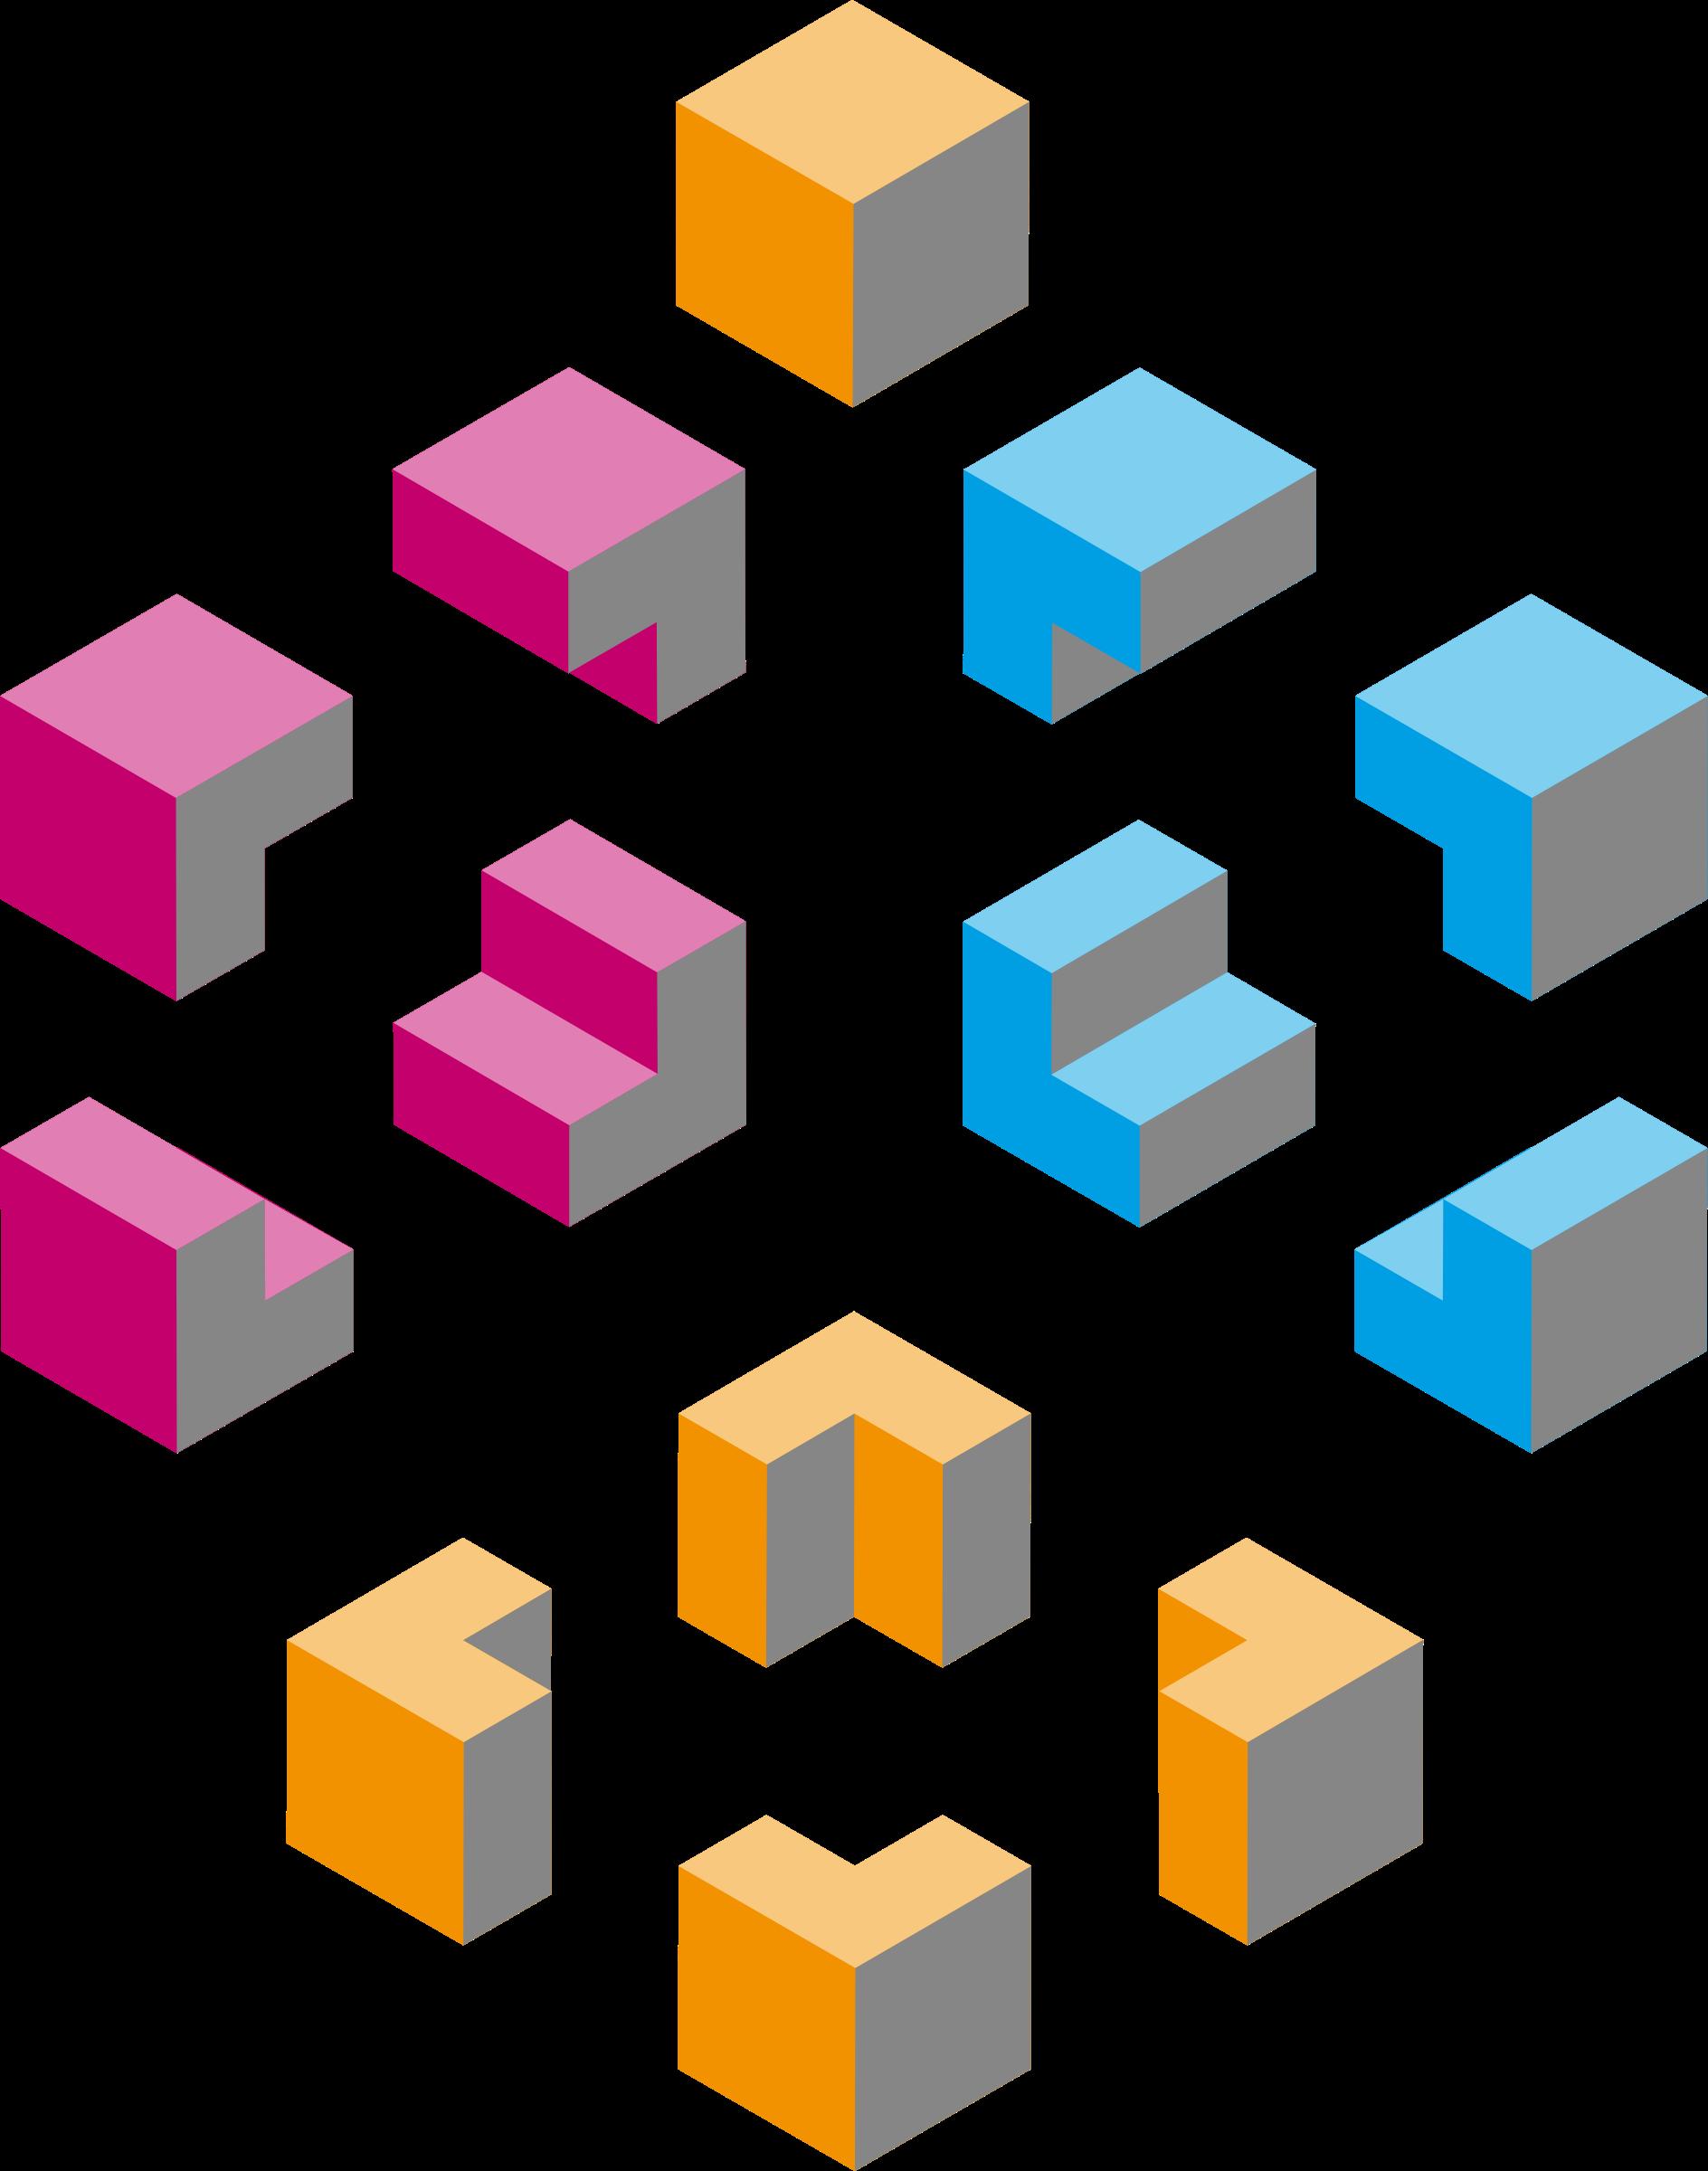 Cube clipart cube shape. Isometric shapes cubes big